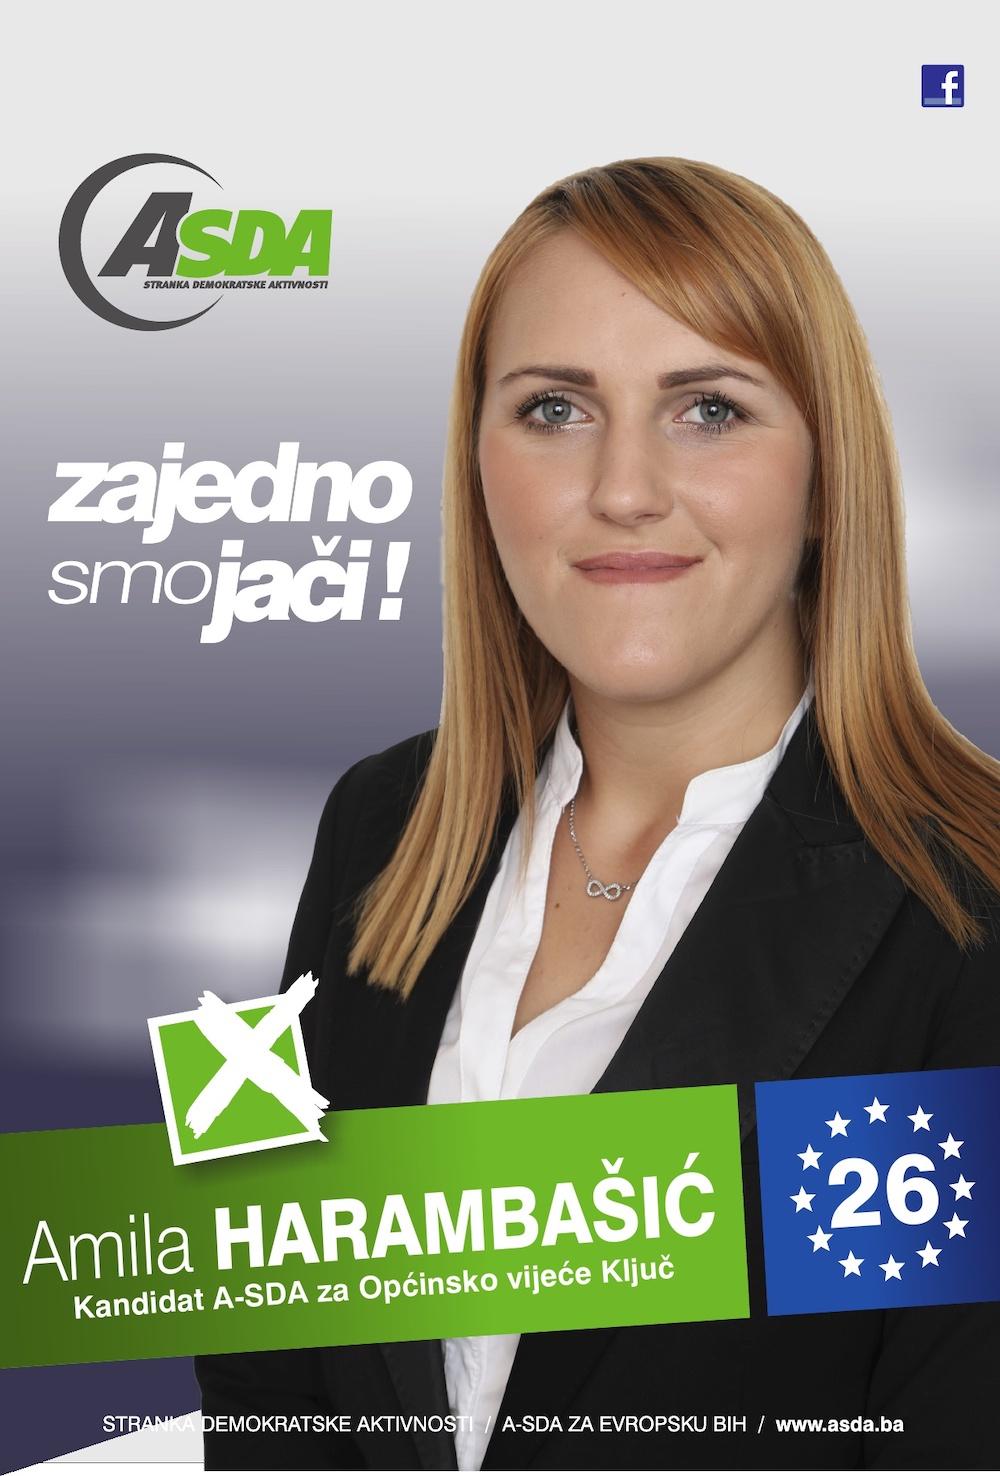 Amila Harambašić